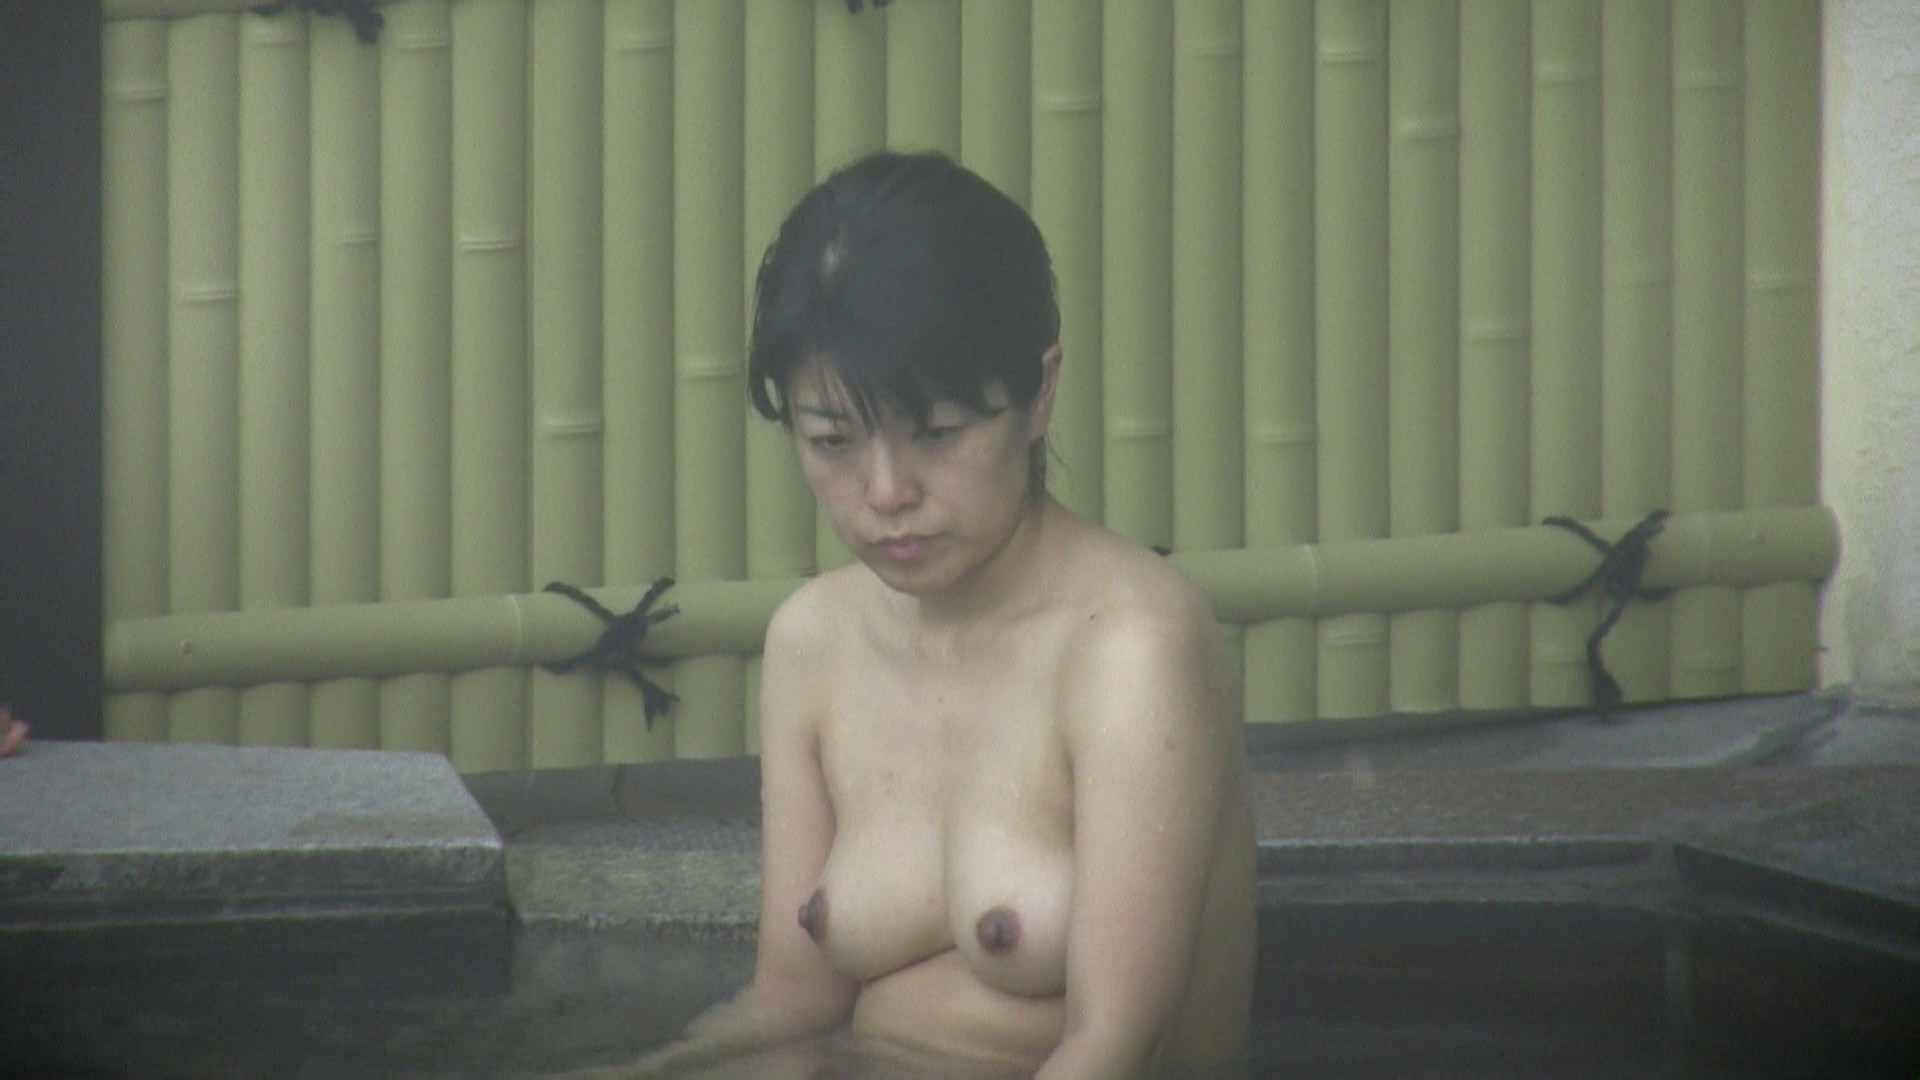 Aquaな露天風呂Vol.585 露天 オマンコ無修正動画無料 51画像 32